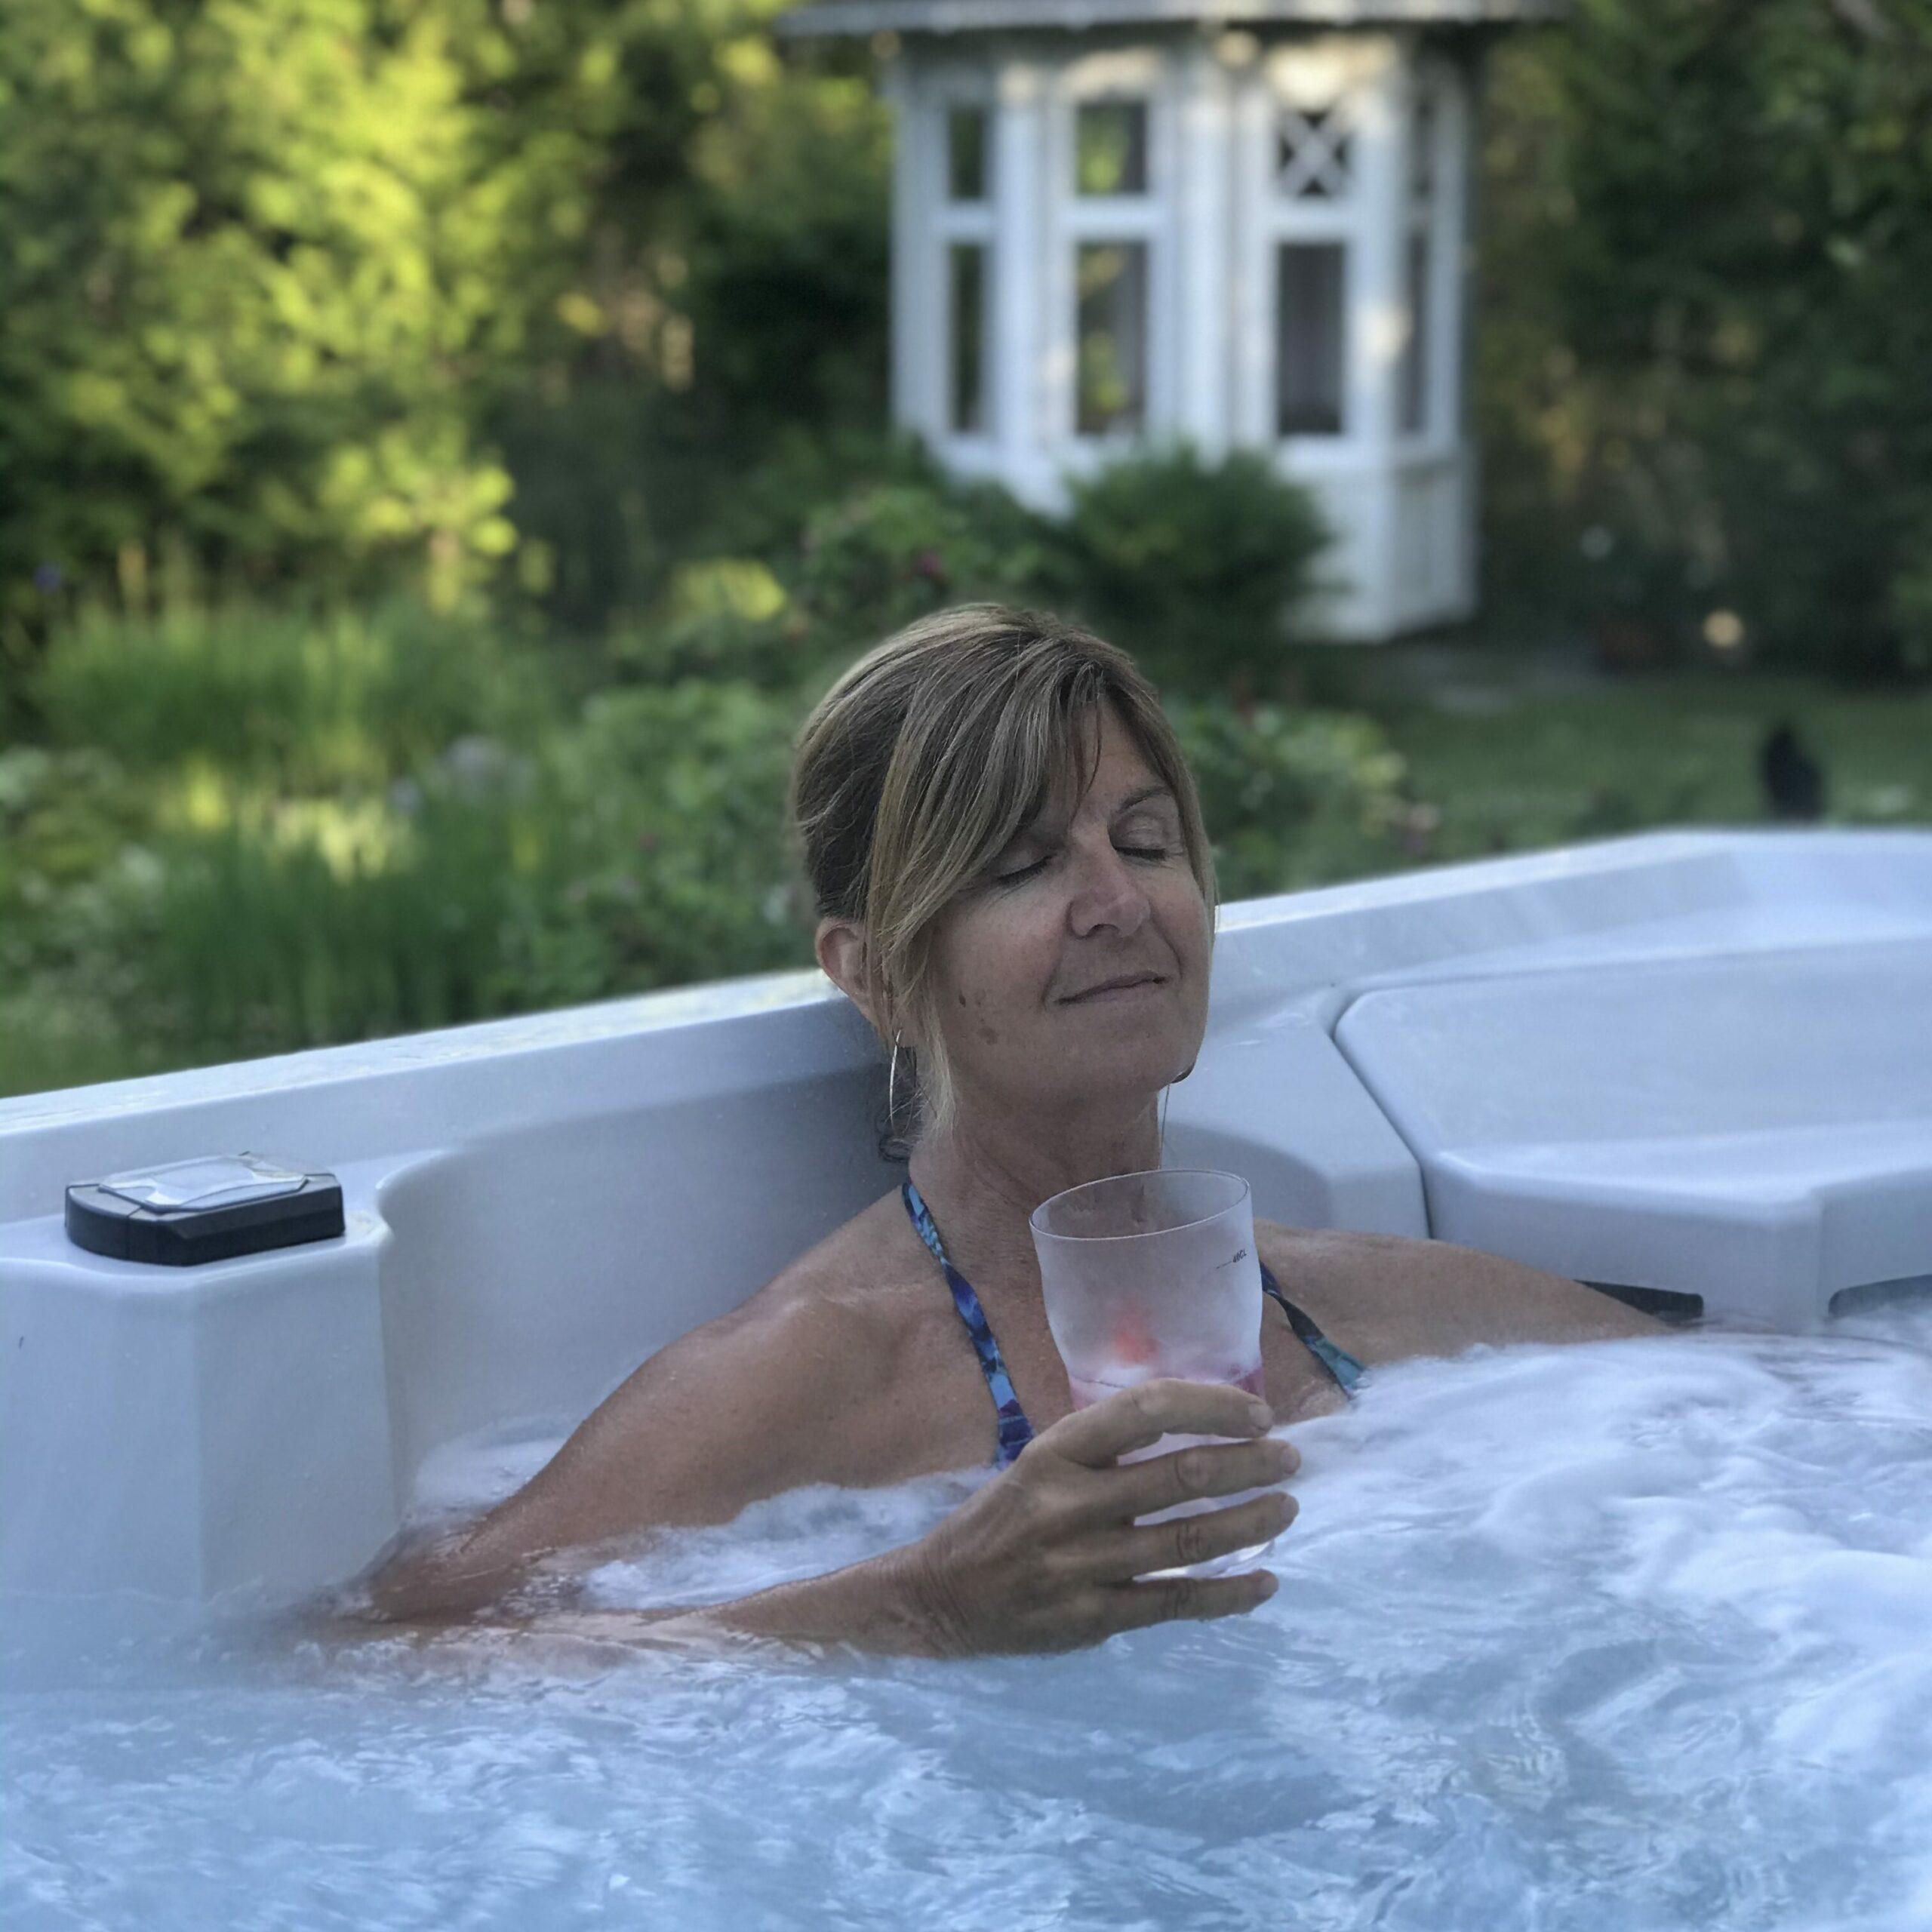 spa bath in garden